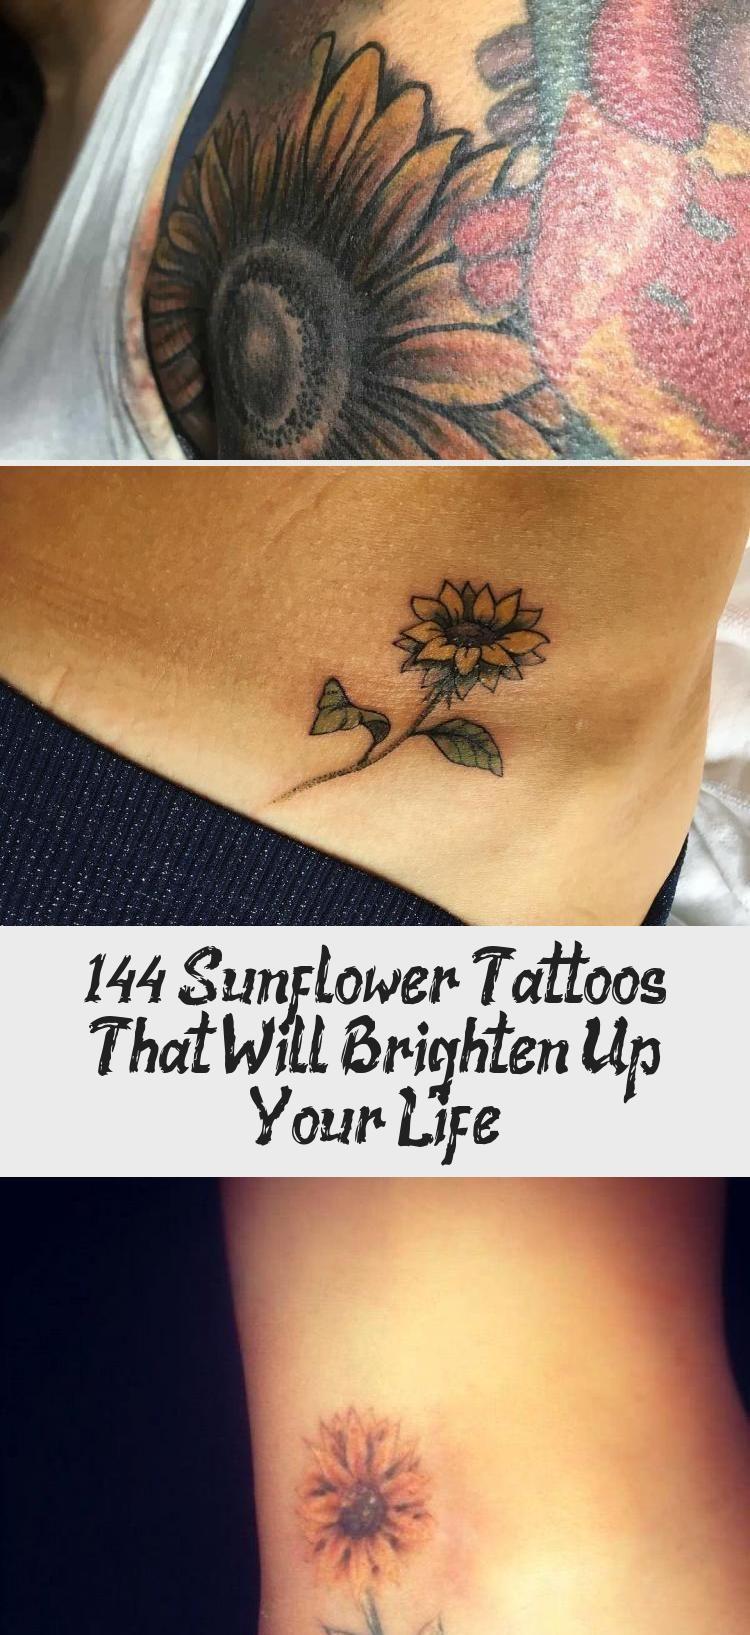 Photo of 144 Sunflower Tattoos That Will Brighten Up Your Life #sunflowertattoosBehindEar…